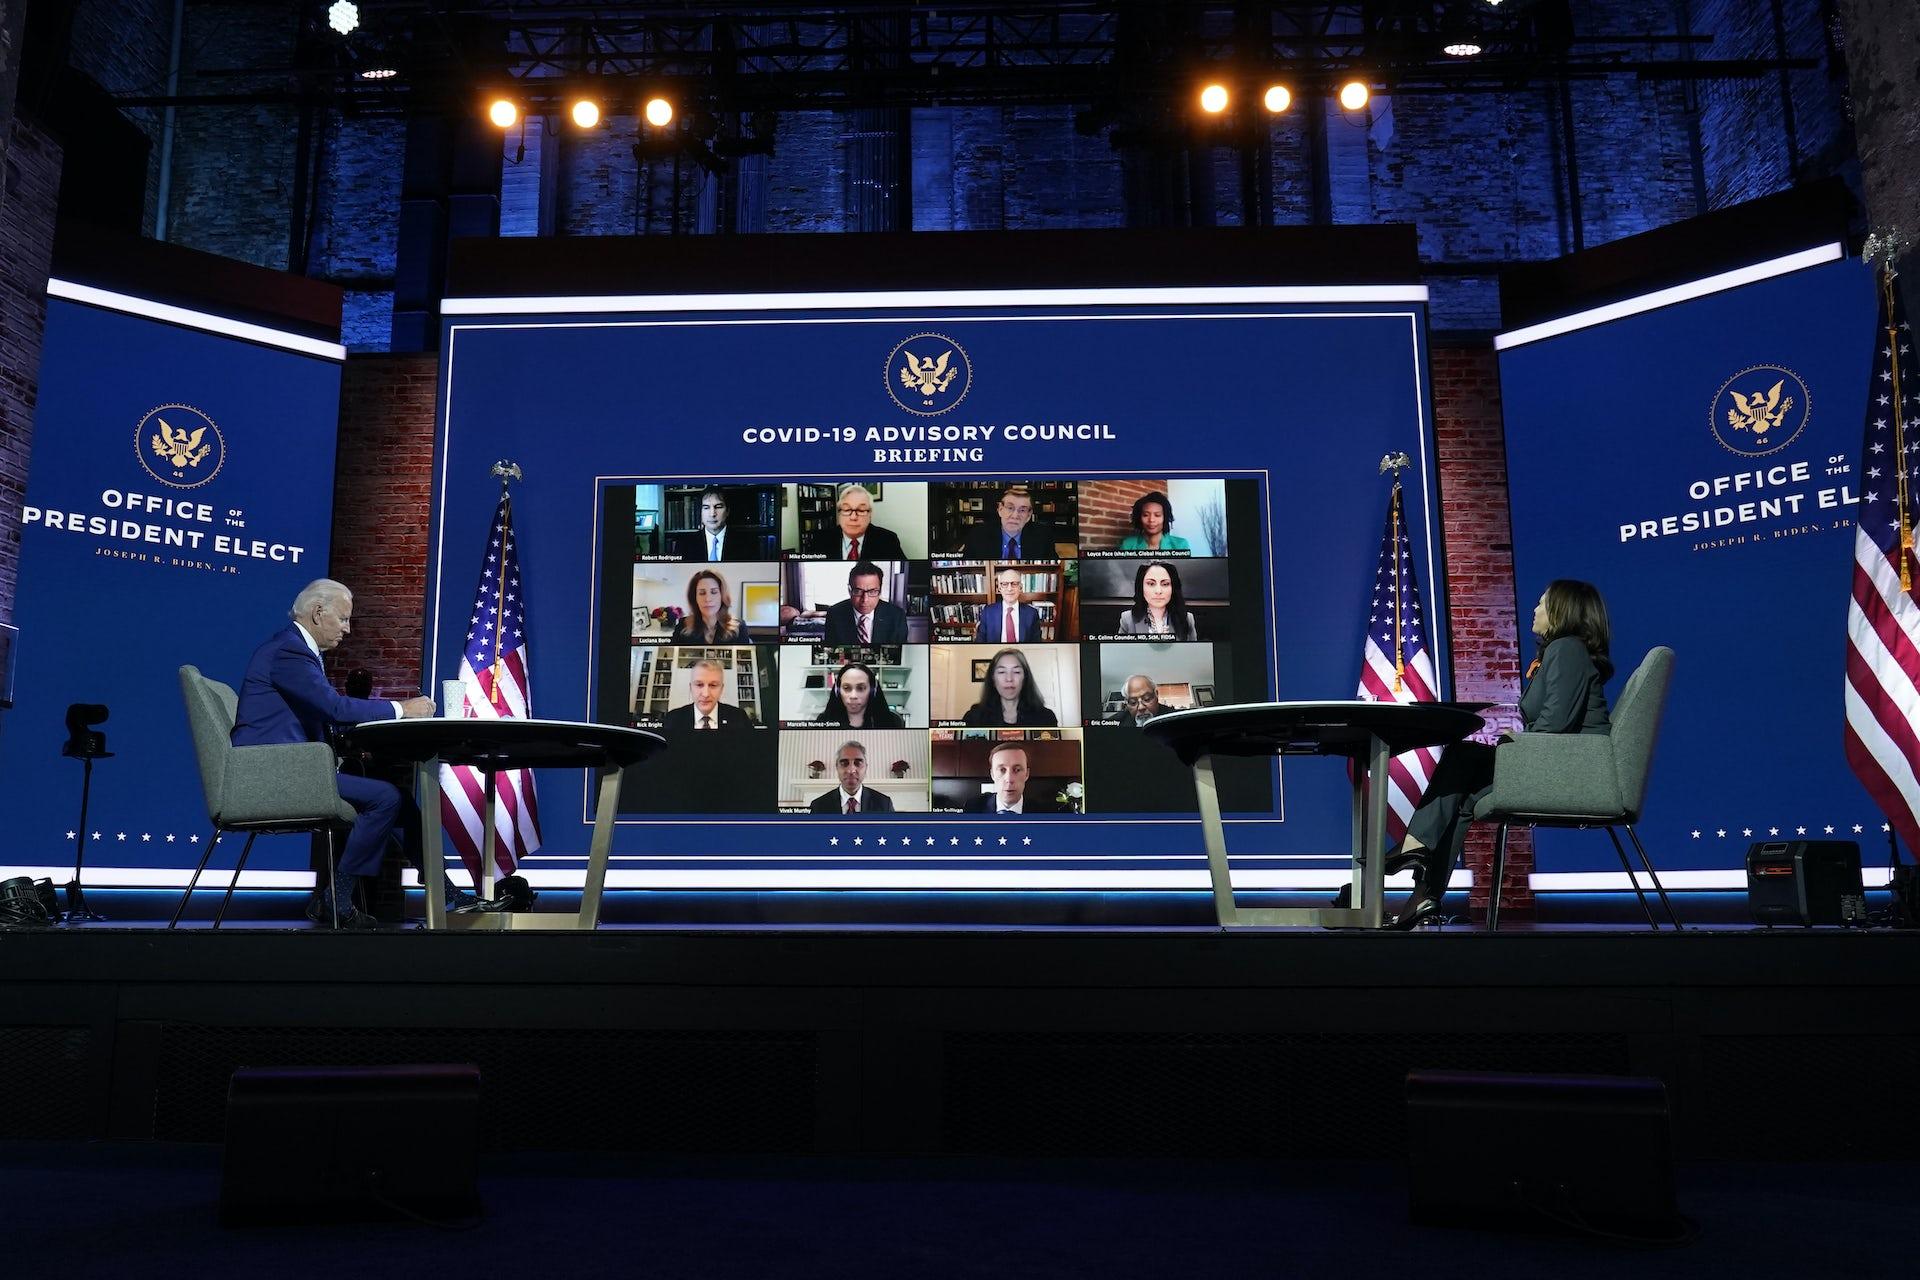 President-elect Joe Biden and Vice President-elect Kamala Harris in a meeting with Biden's COVID-19 advisory council.